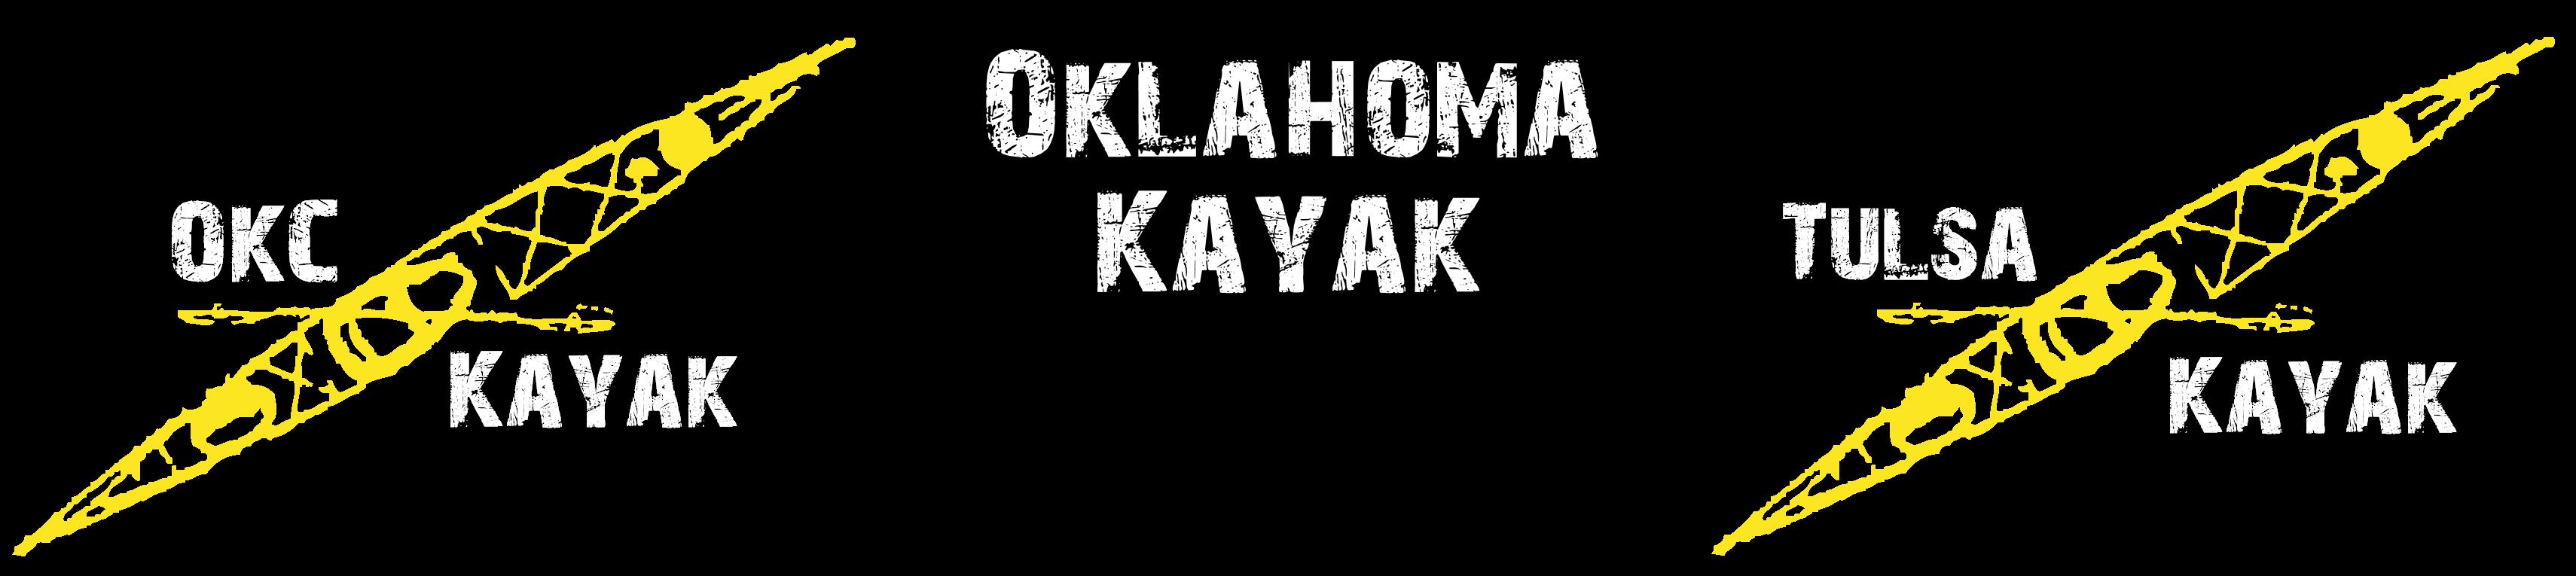 OK Kayak Banner